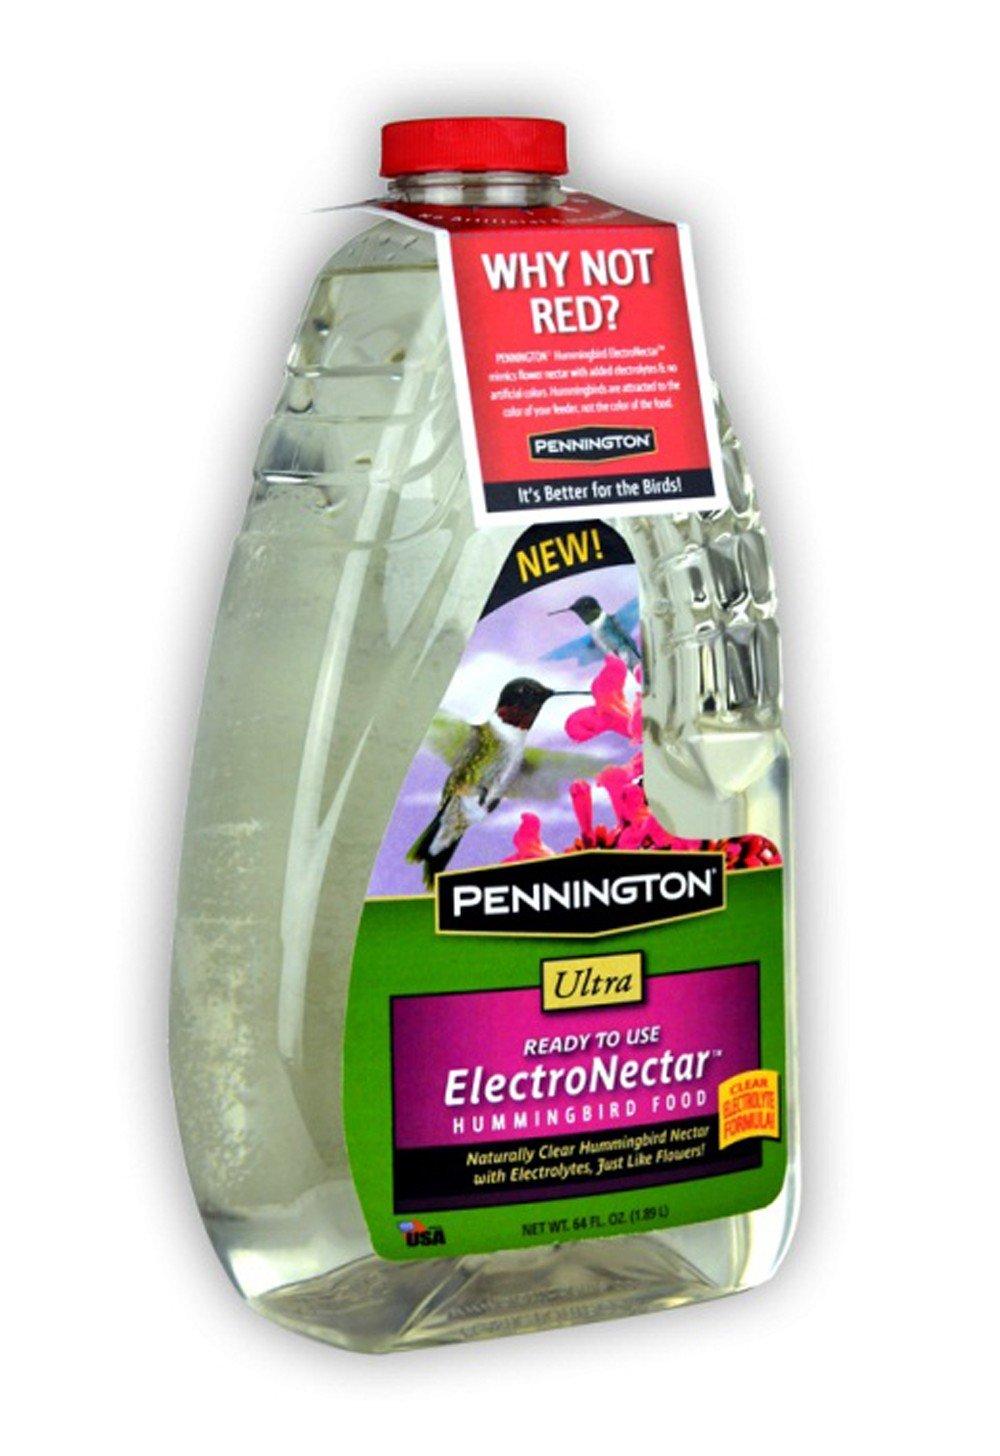 Pennington Ready to Use Electronectar, 64 oz, Clear